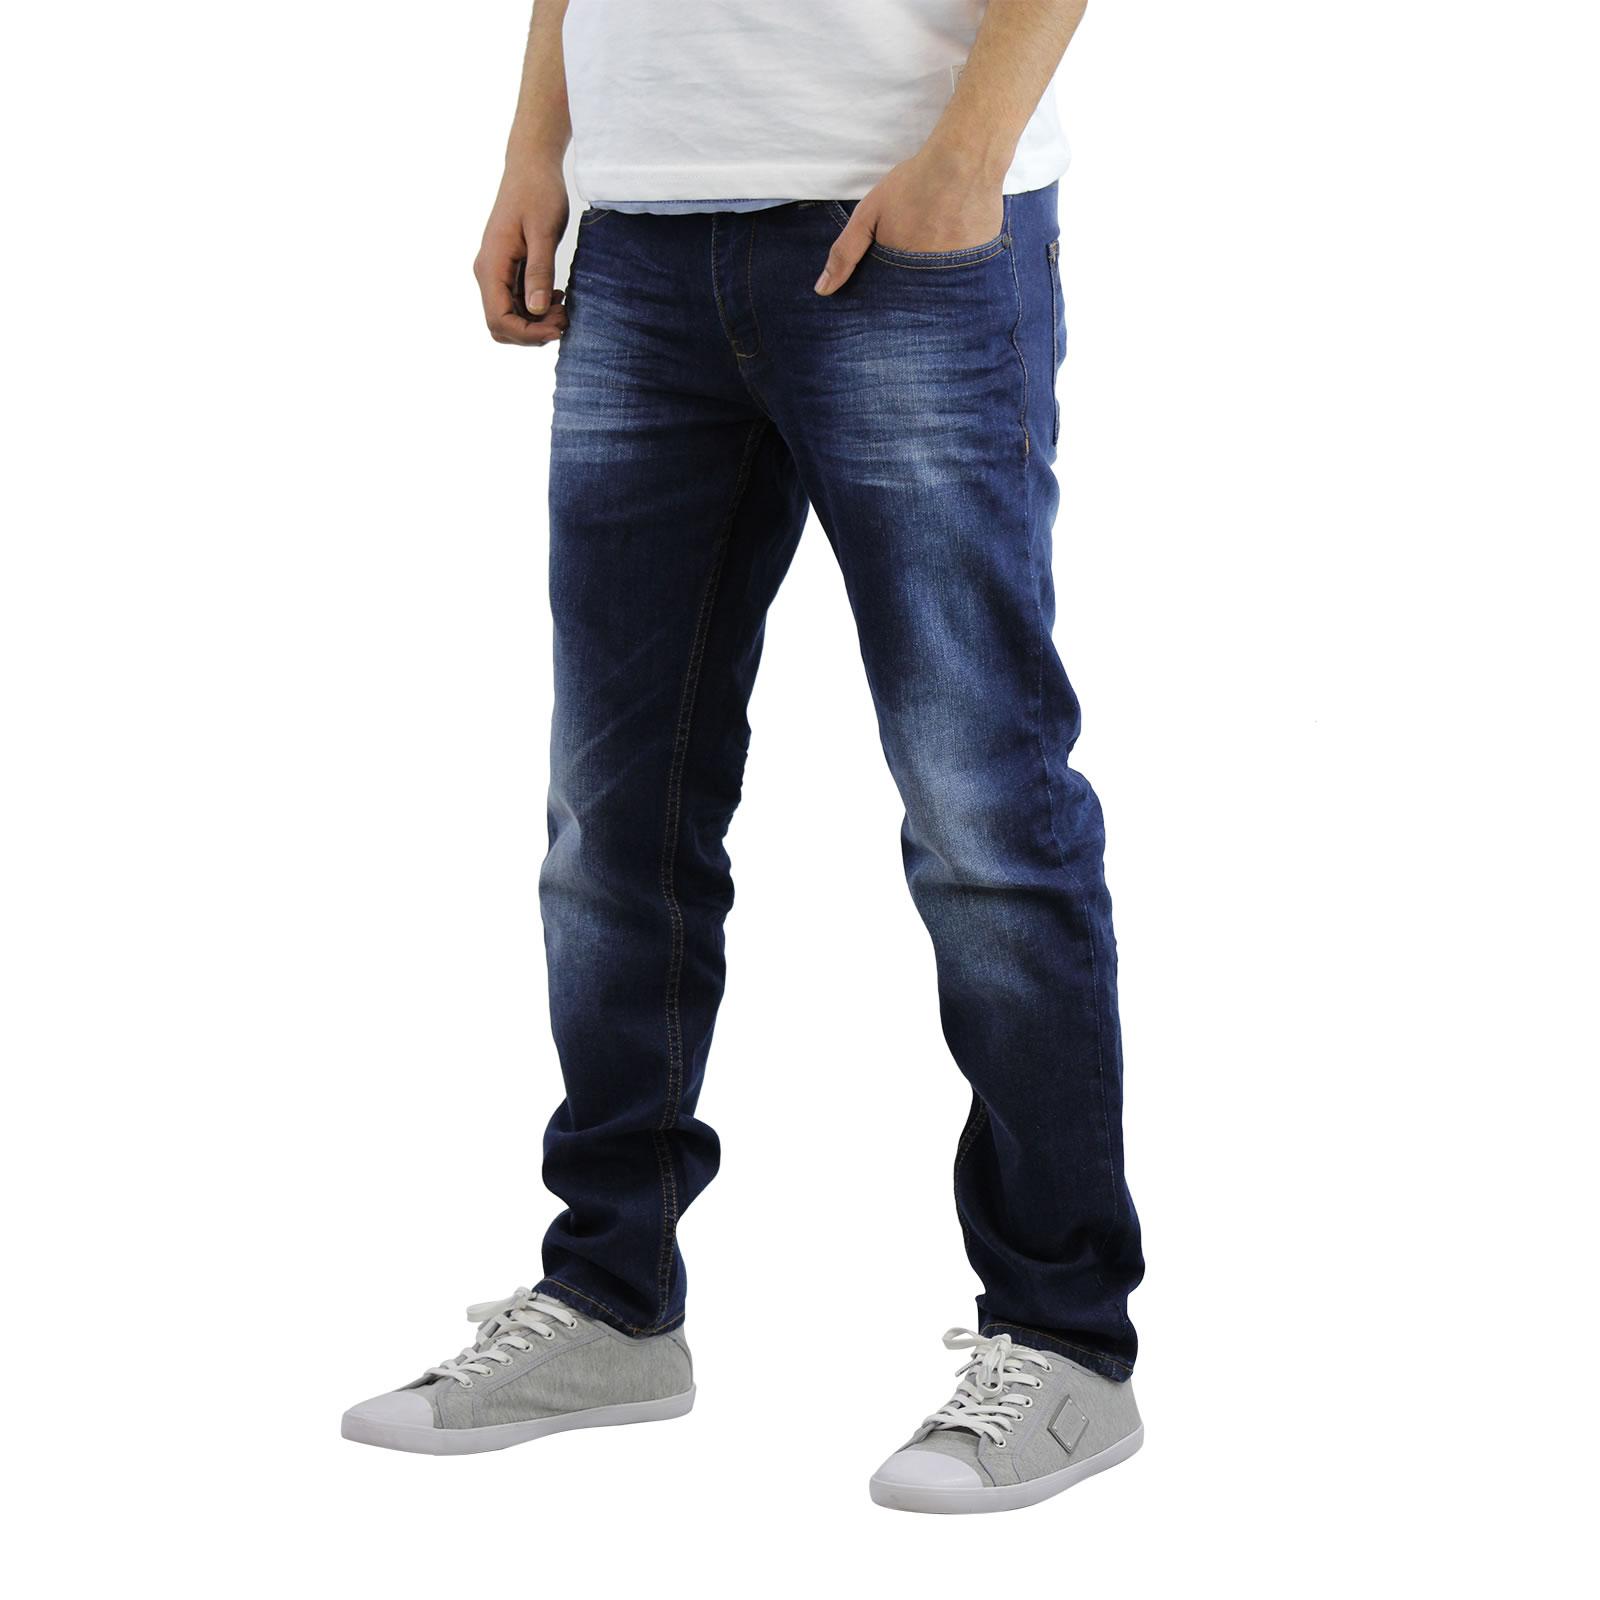 miniature 6 - Homme Crosshatch Jaco Slim Jeans stretch pantalon denim effet vieilli